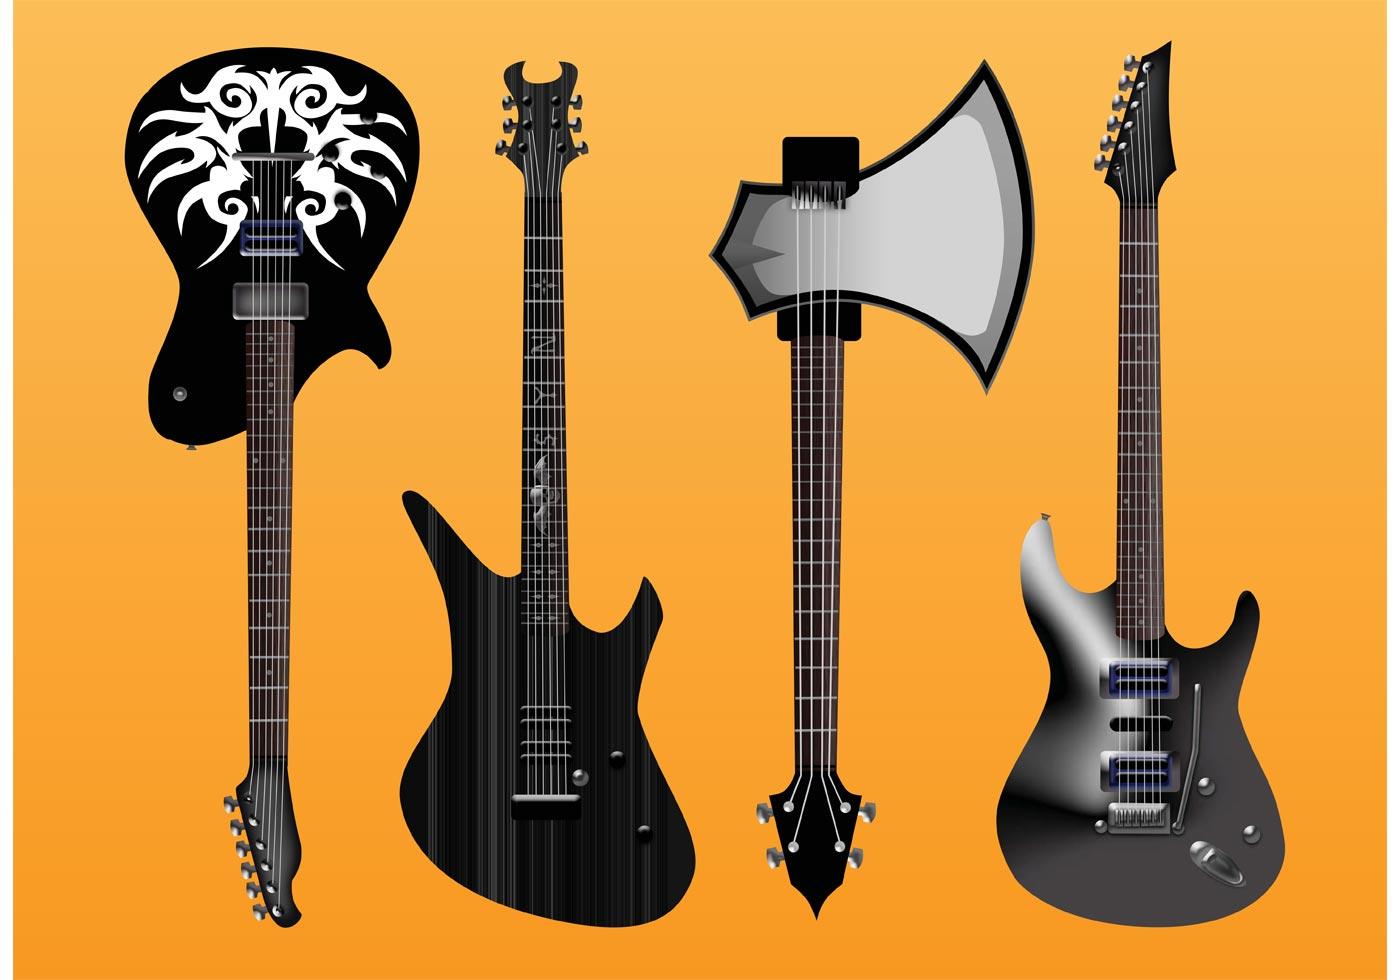 electric guitars vector freebies download free vector art stock graphics images. Black Bedroom Furniture Sets. Home Design Ideas